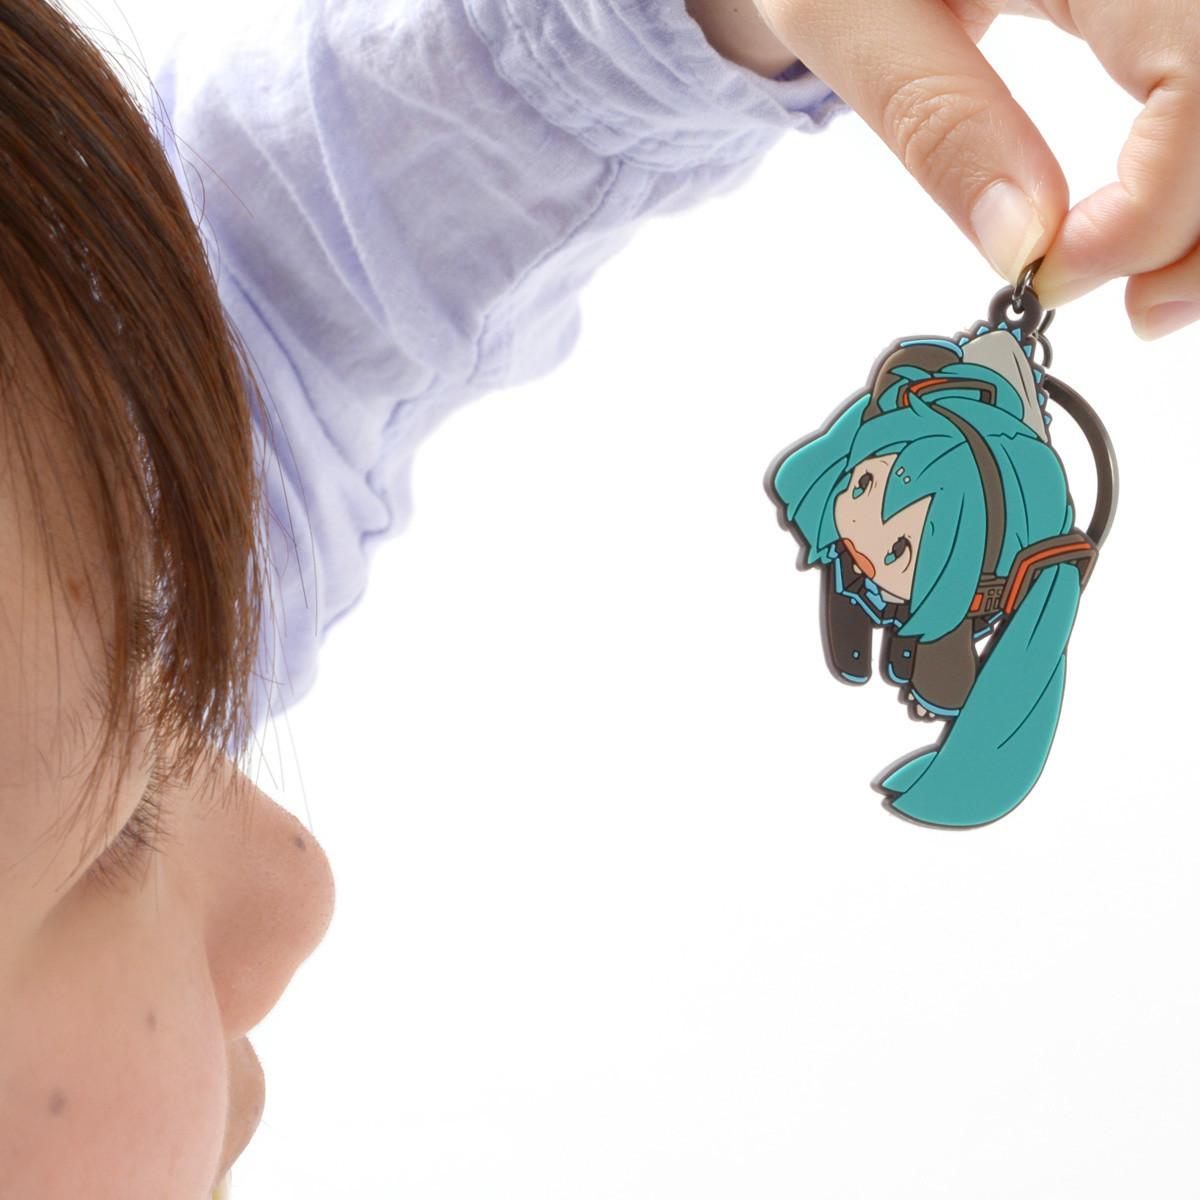 Miku Hastune Tsumamare Cospa Keychain Limited Magical Mirai 2020